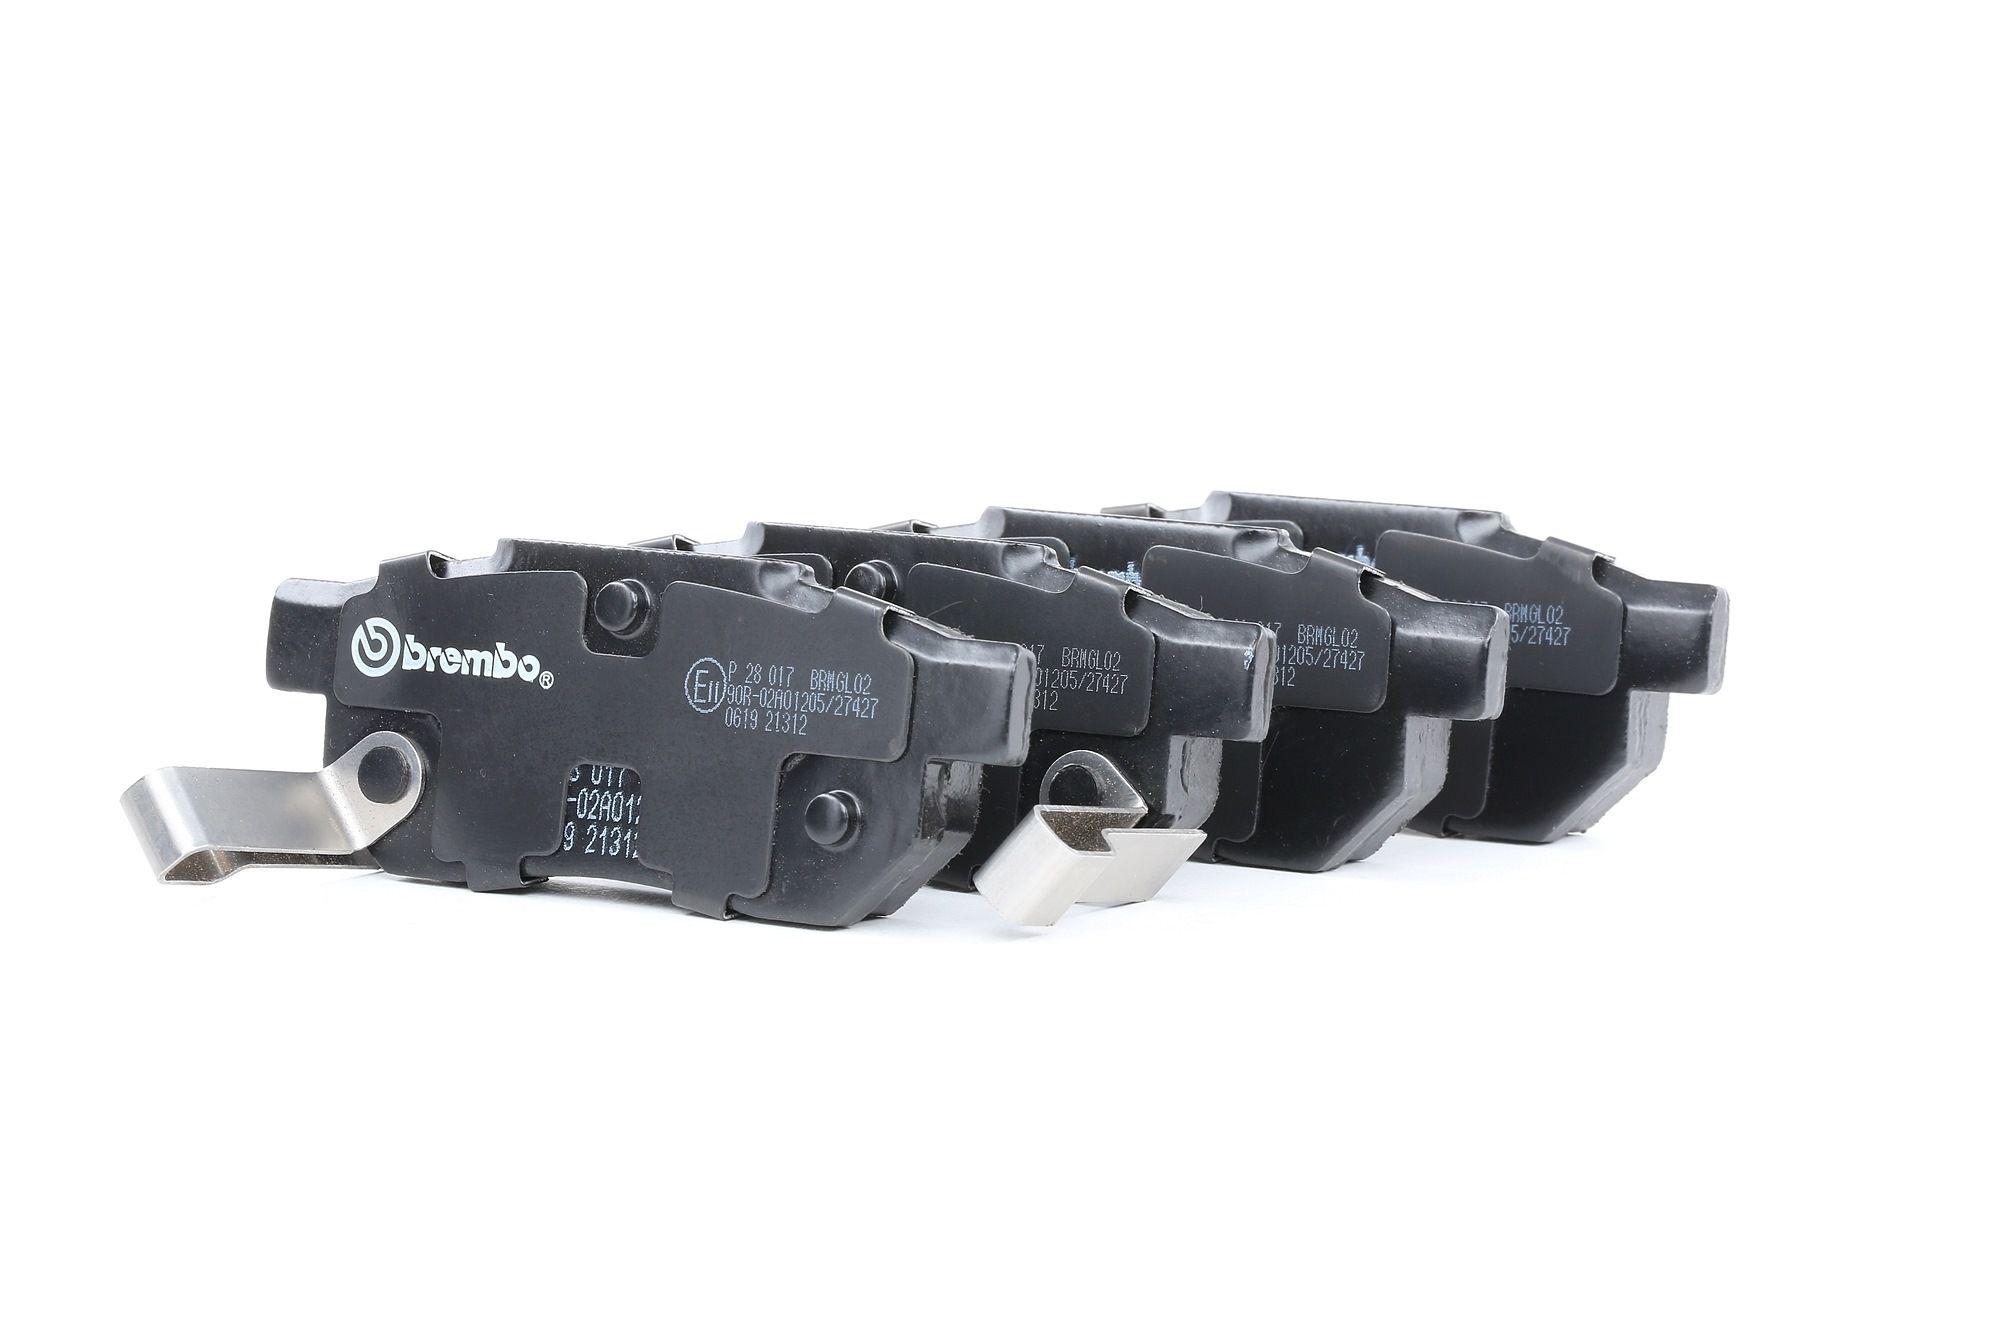 Disk brake pads BREMBO D3737263 rating